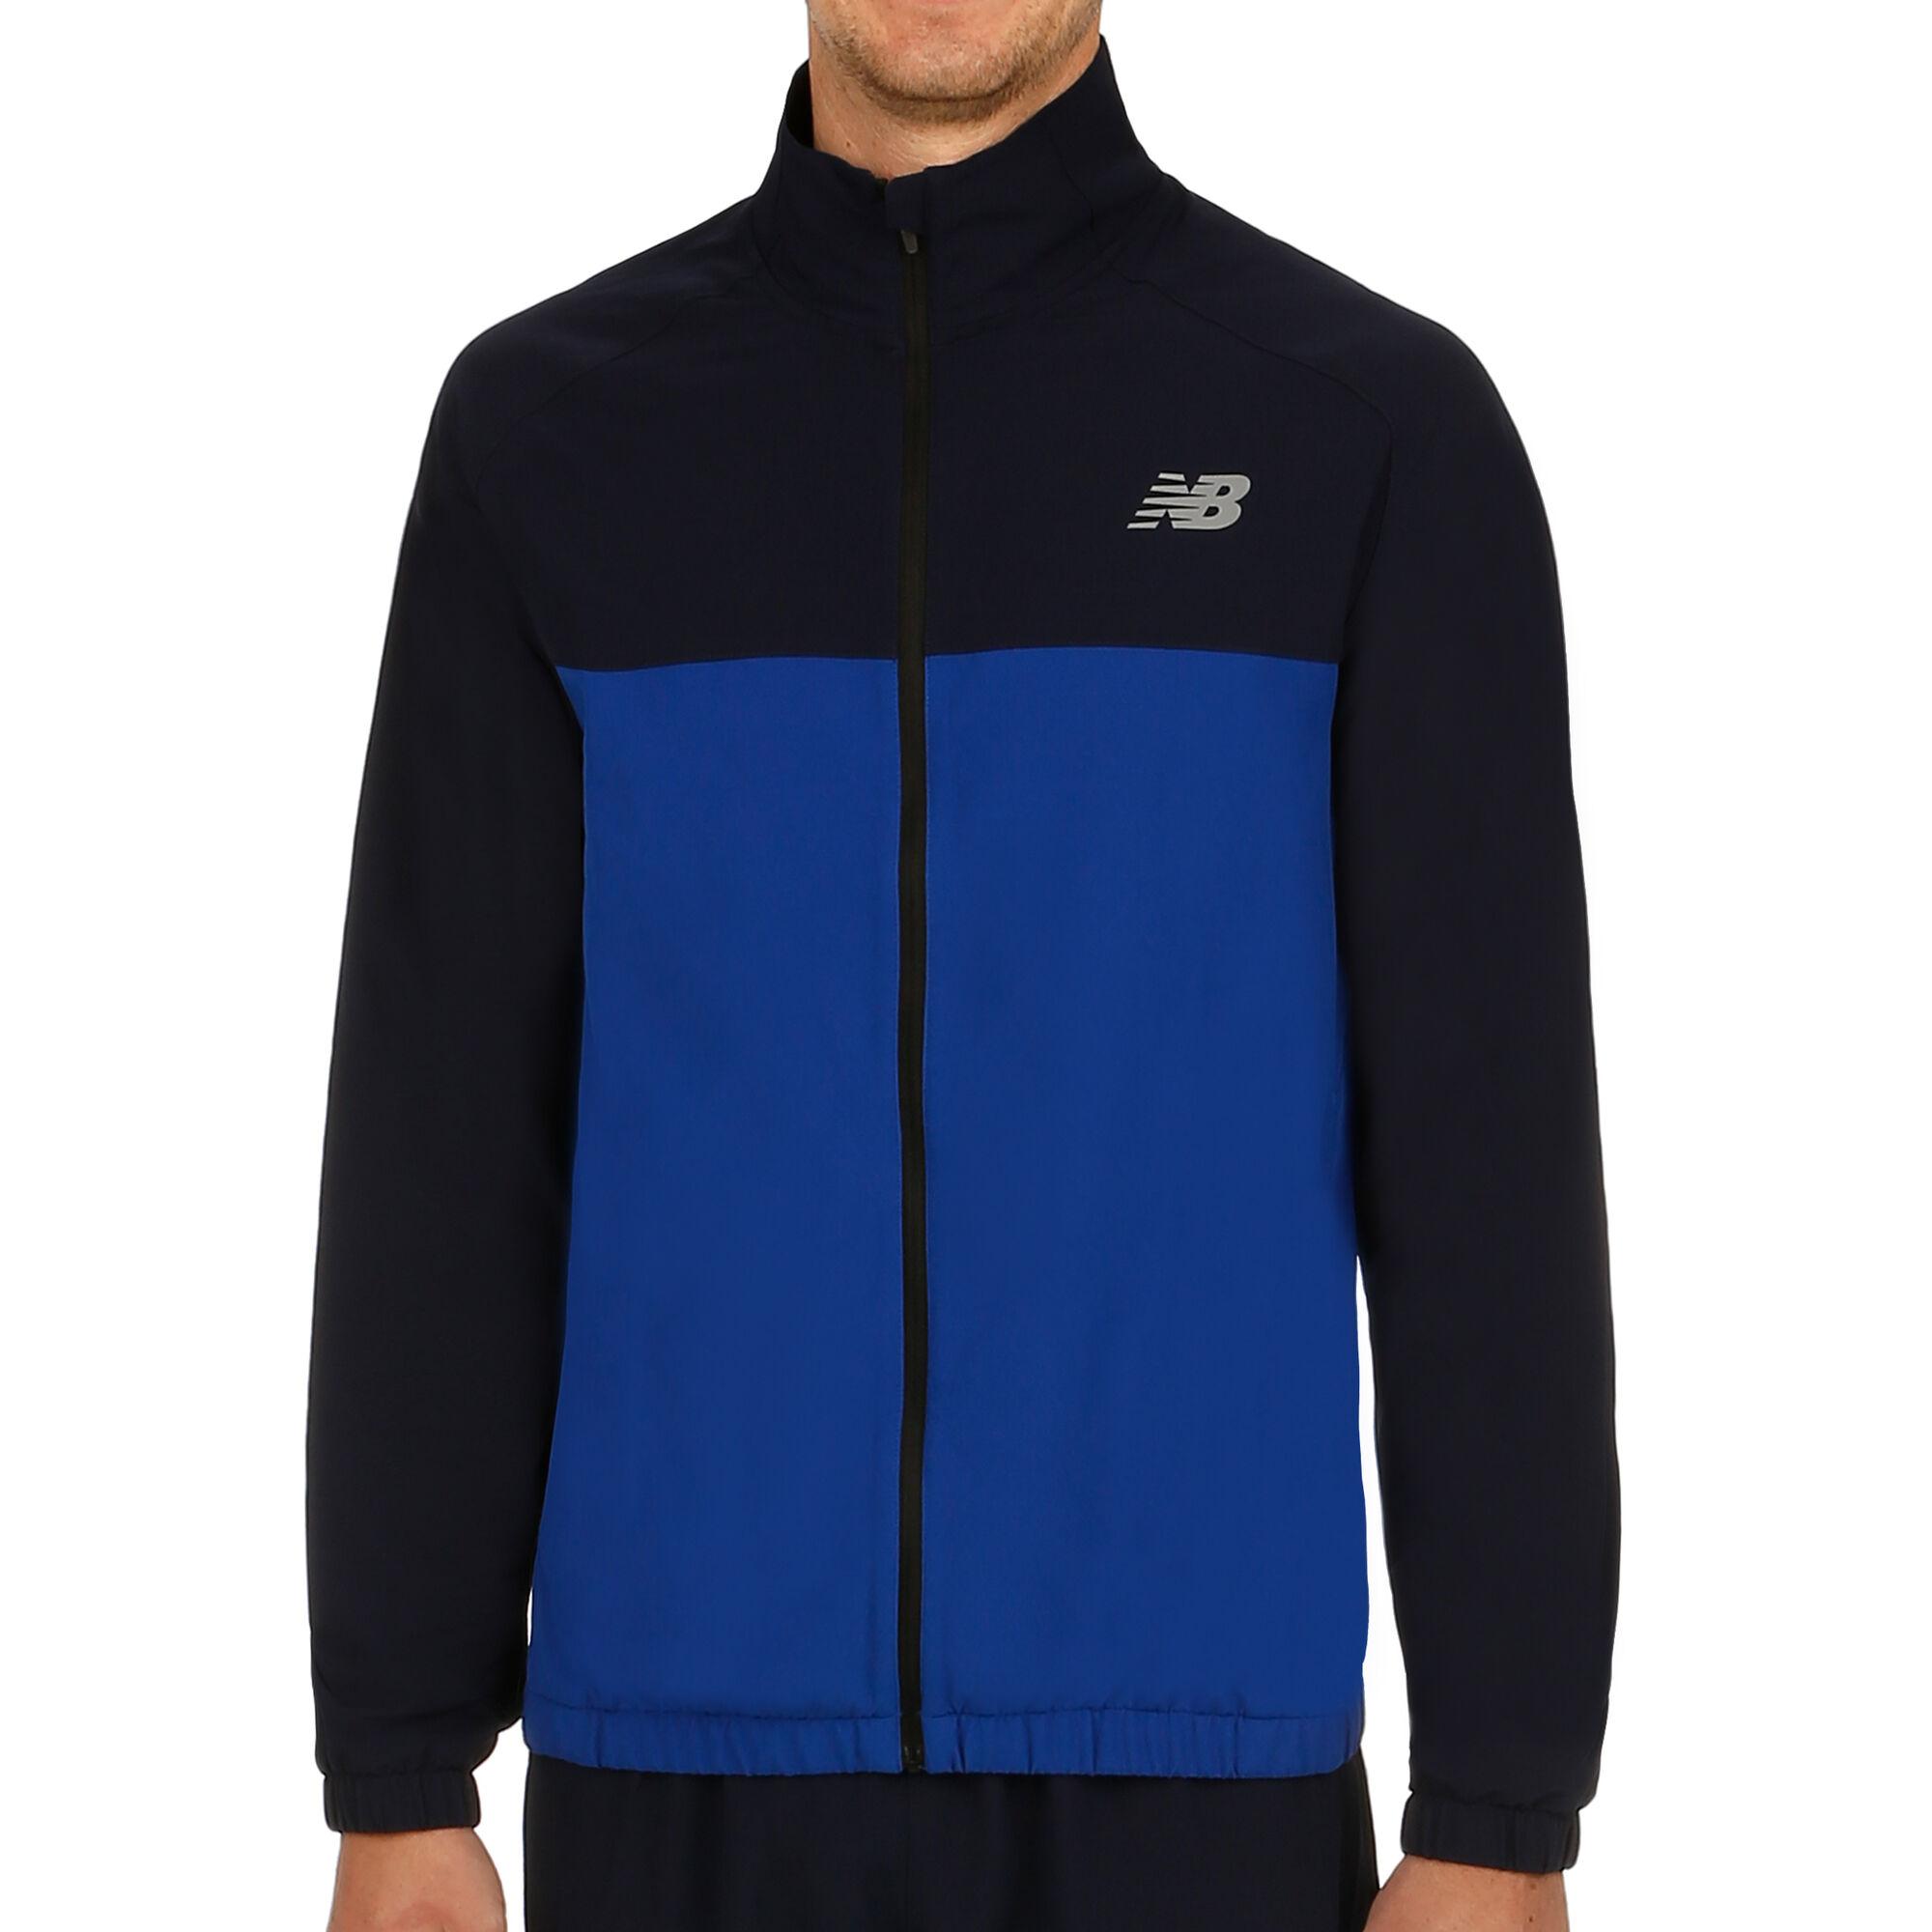 8c8dbc392 buy New Balance Tenacity Woven Running Jacket Men - Dark Blue, Blue ...